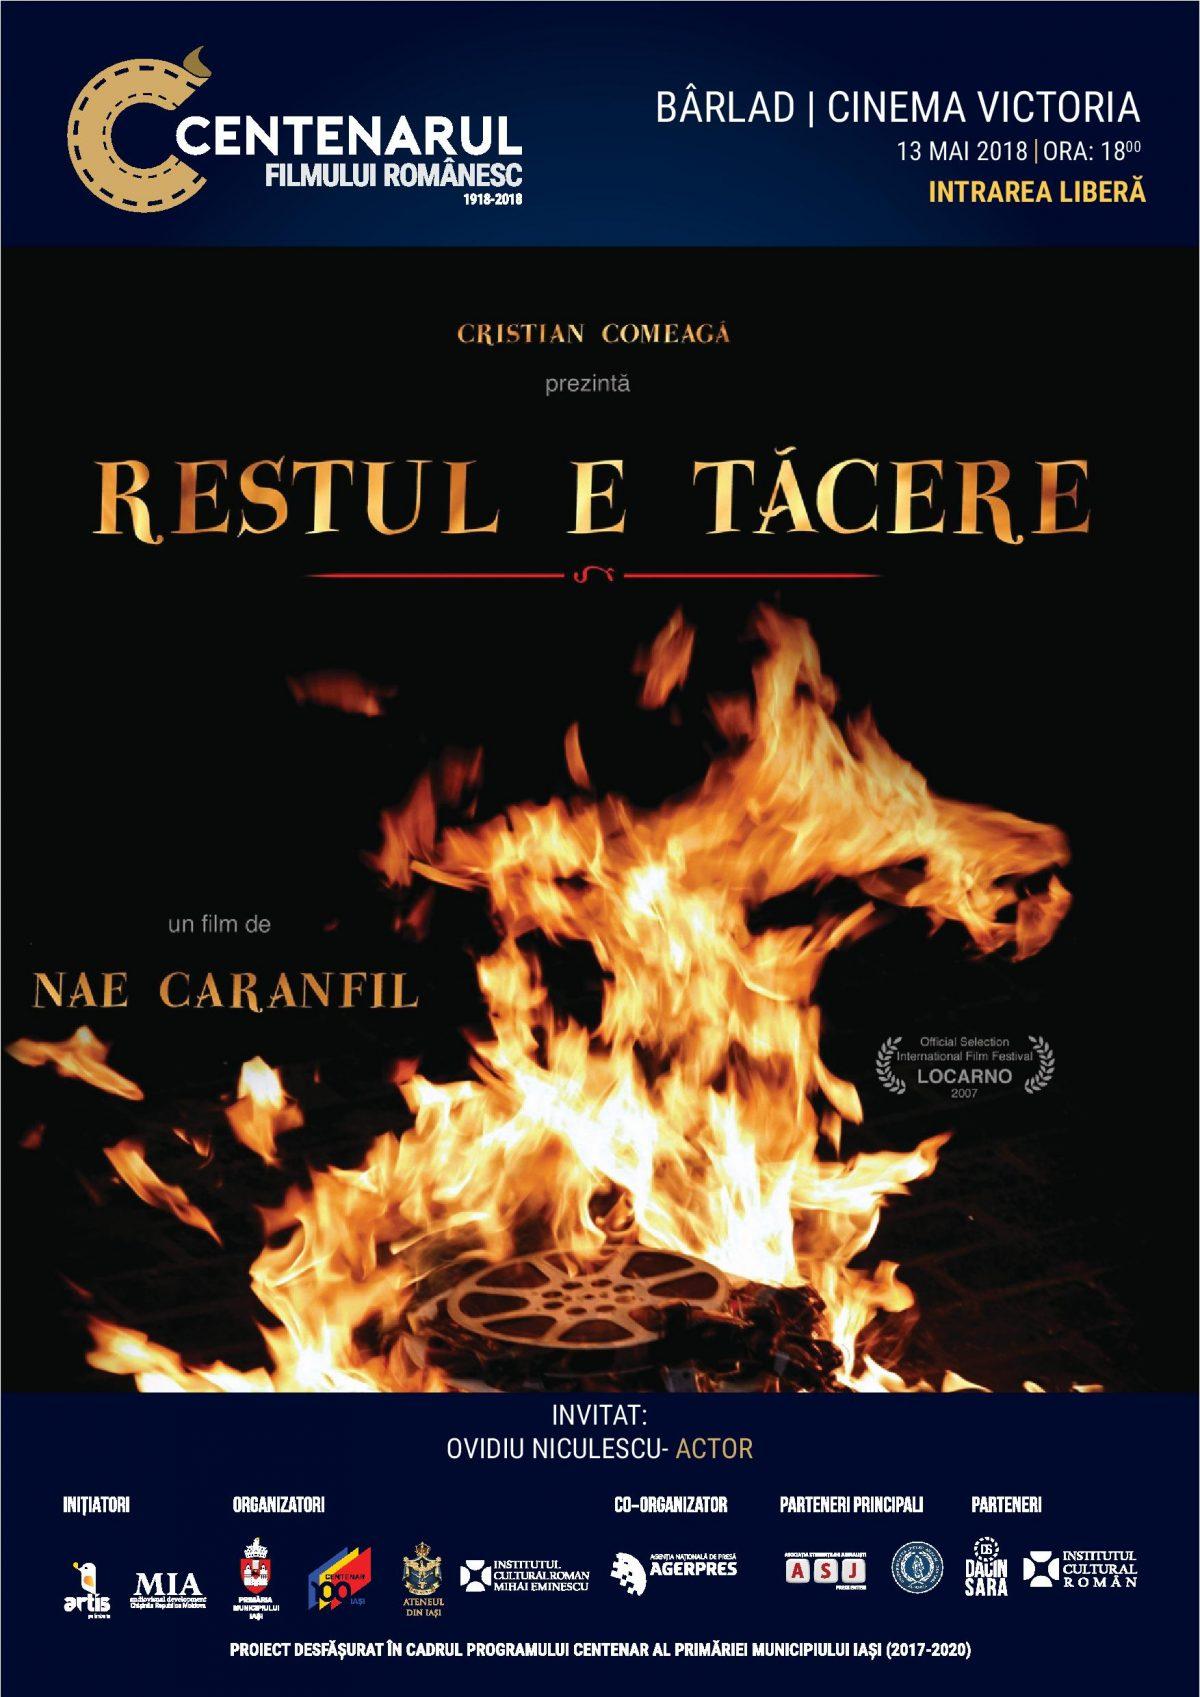 EPISODUL 9: BÂRLAD | CINEMA VICTORIA | RESTUL E TACERE (2007)